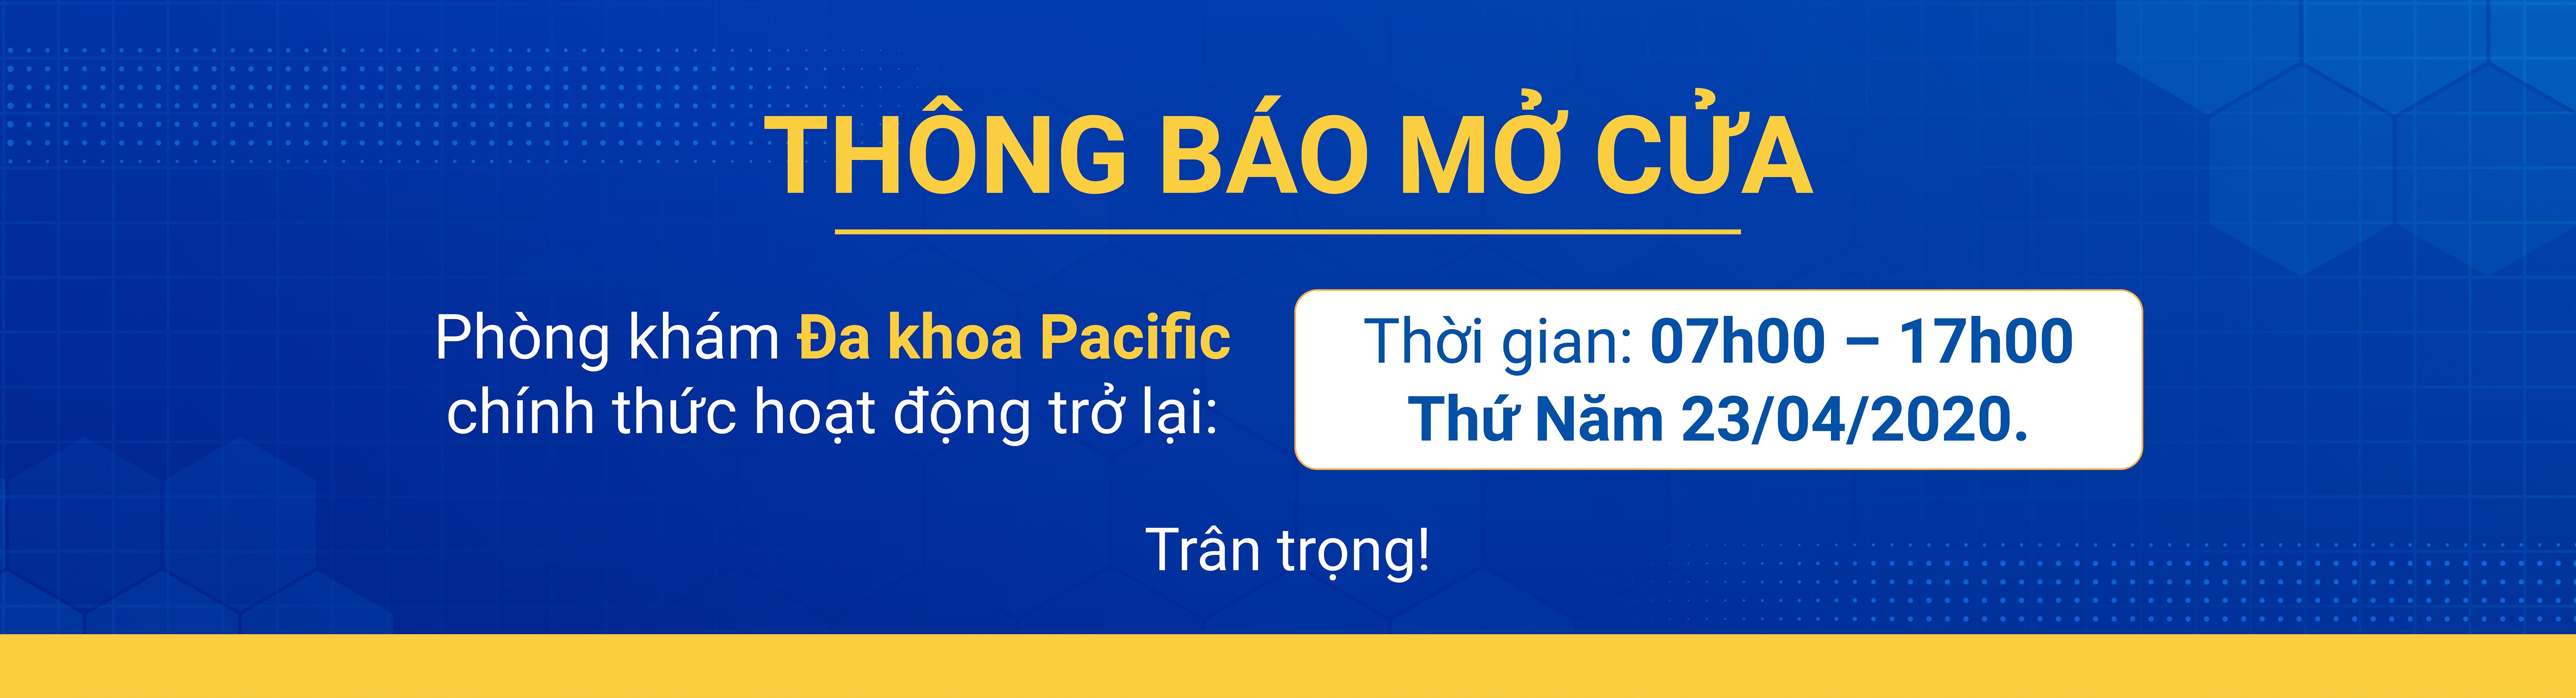 Banner_ThongBaoMoCua-Web